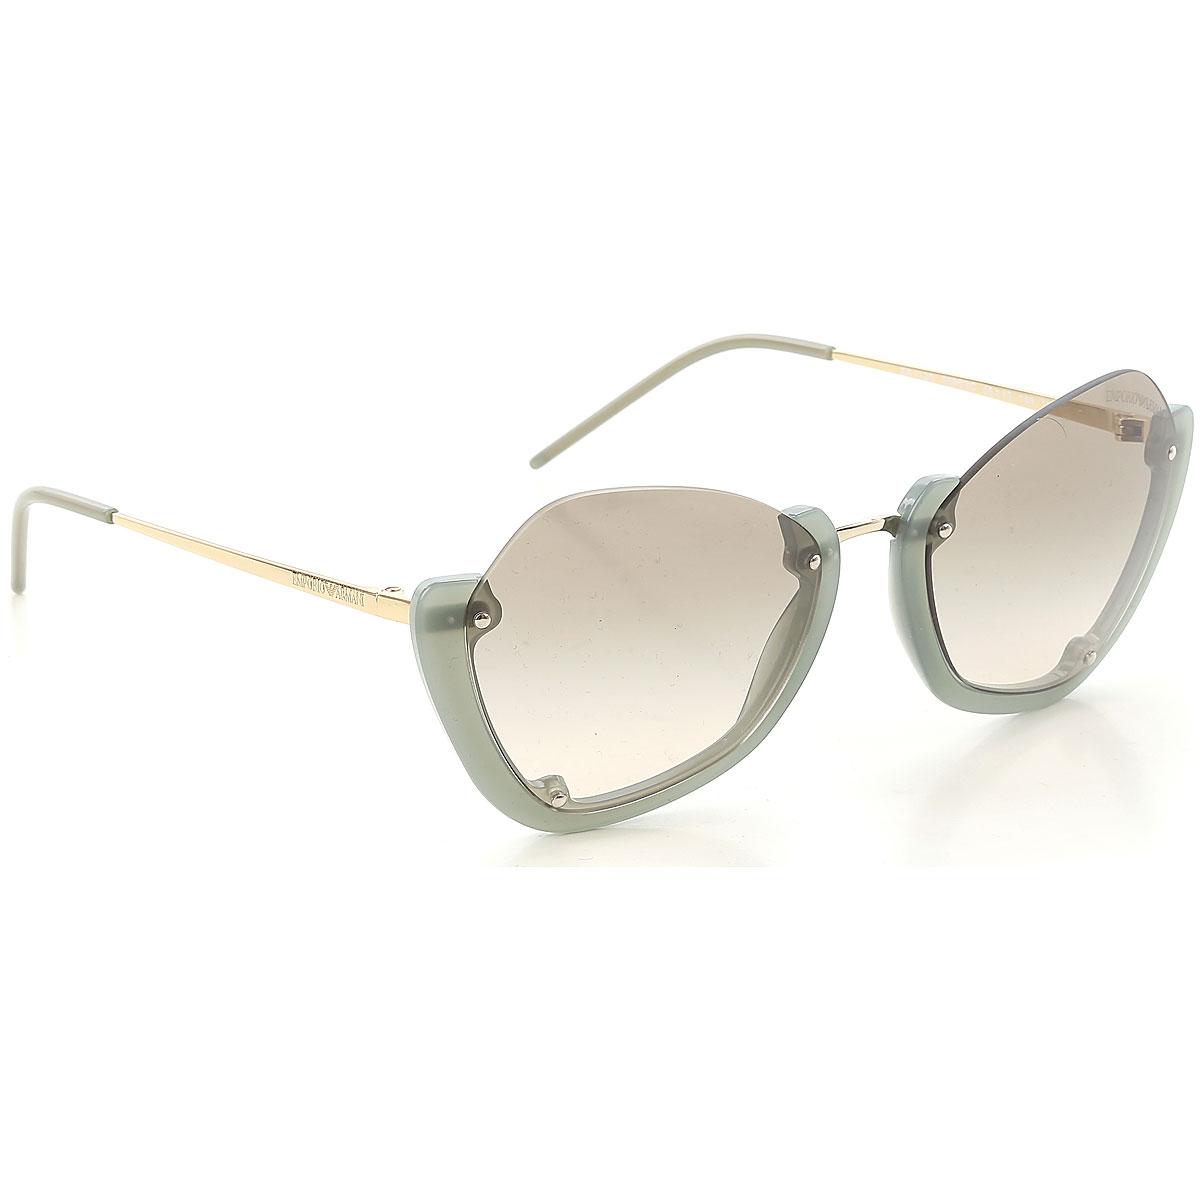 Image of Emporio Armani Sunglasses On Sale, Grey, 2017